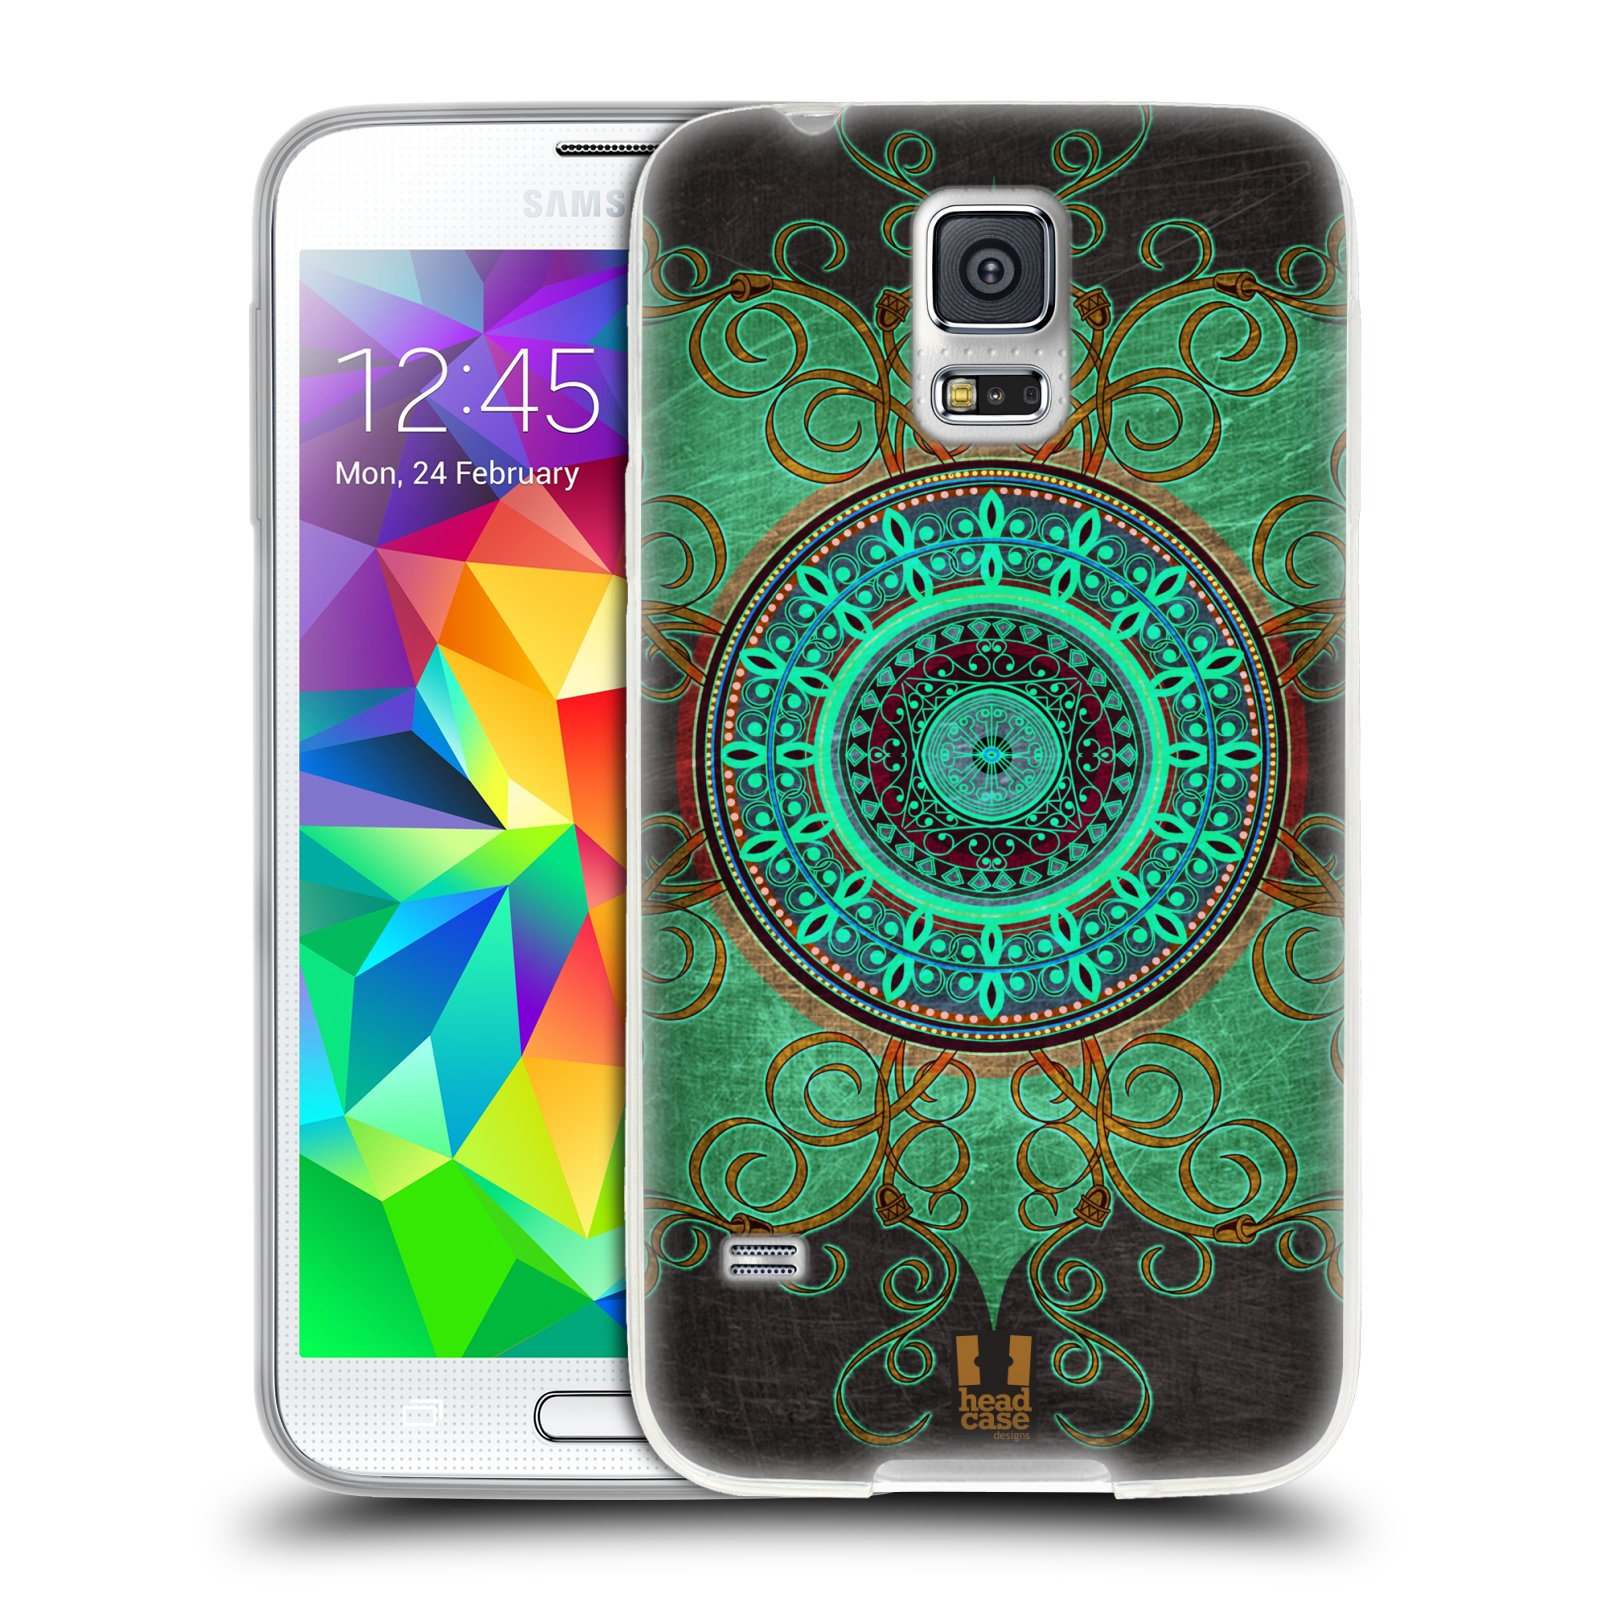 Silikonové pouzdro na mobil Samsung Galaxy S5 Neo HEAD CASE ARAB MANDALA